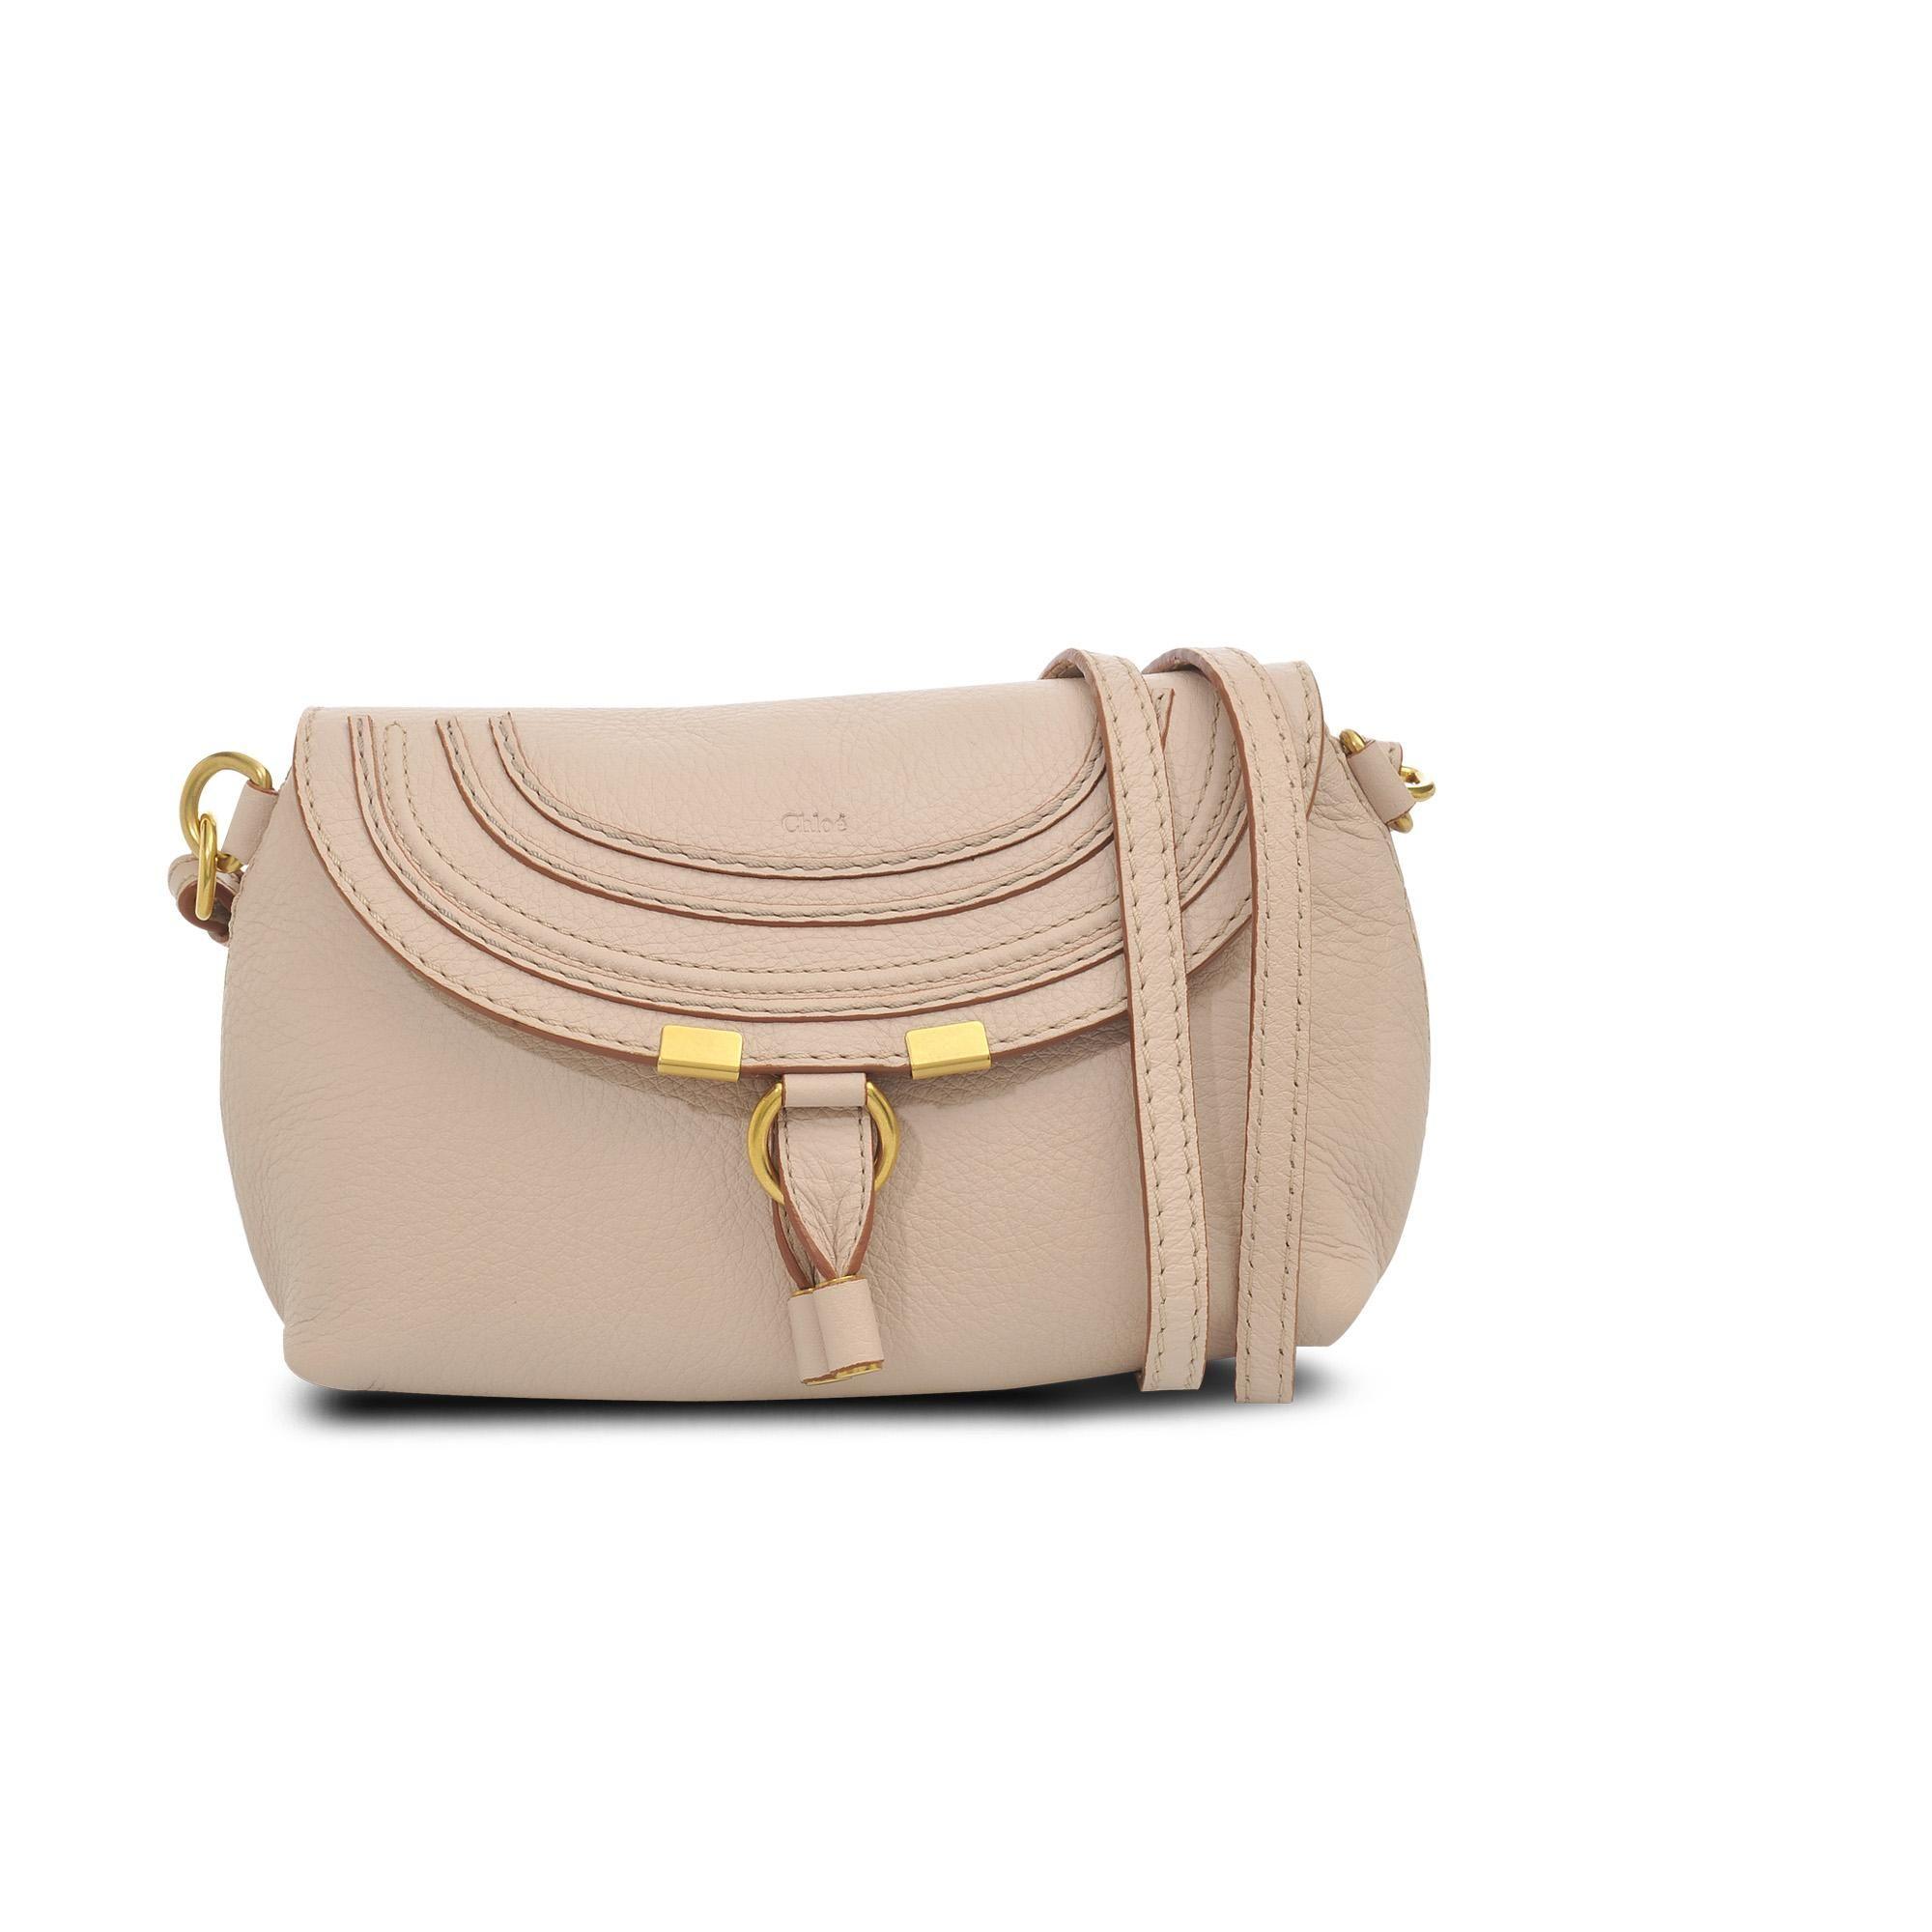 767ed3de42 Chloé Marcie pochette - MONNIER Frères - Cross body purse or clutch ...